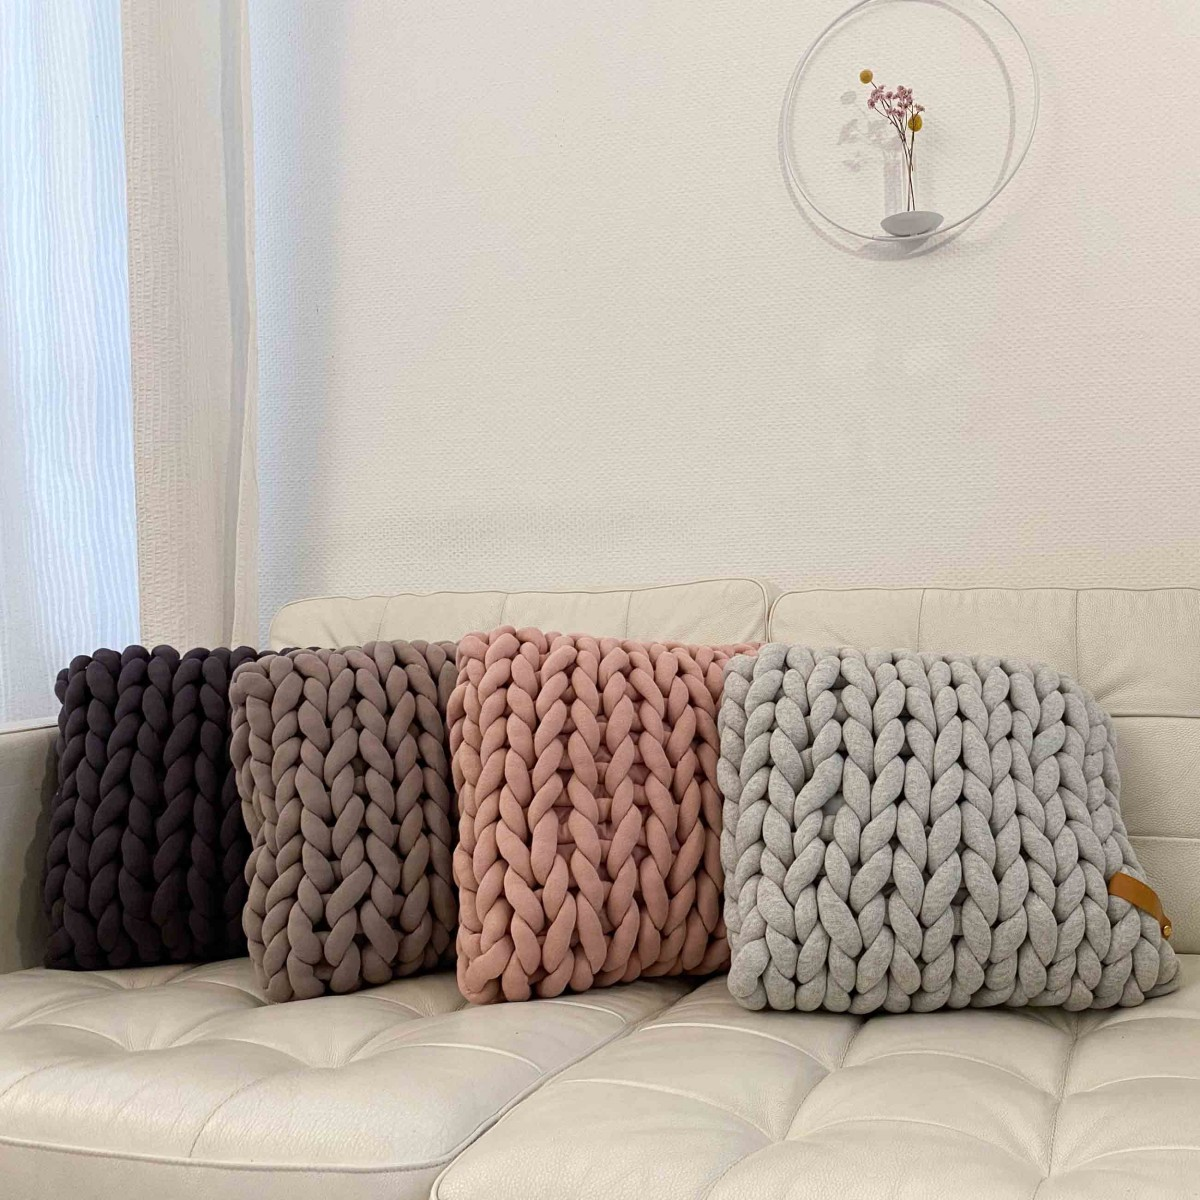 adorist - XXL Grobstrick Cotton Tube Kissen 45x40cm, mauve